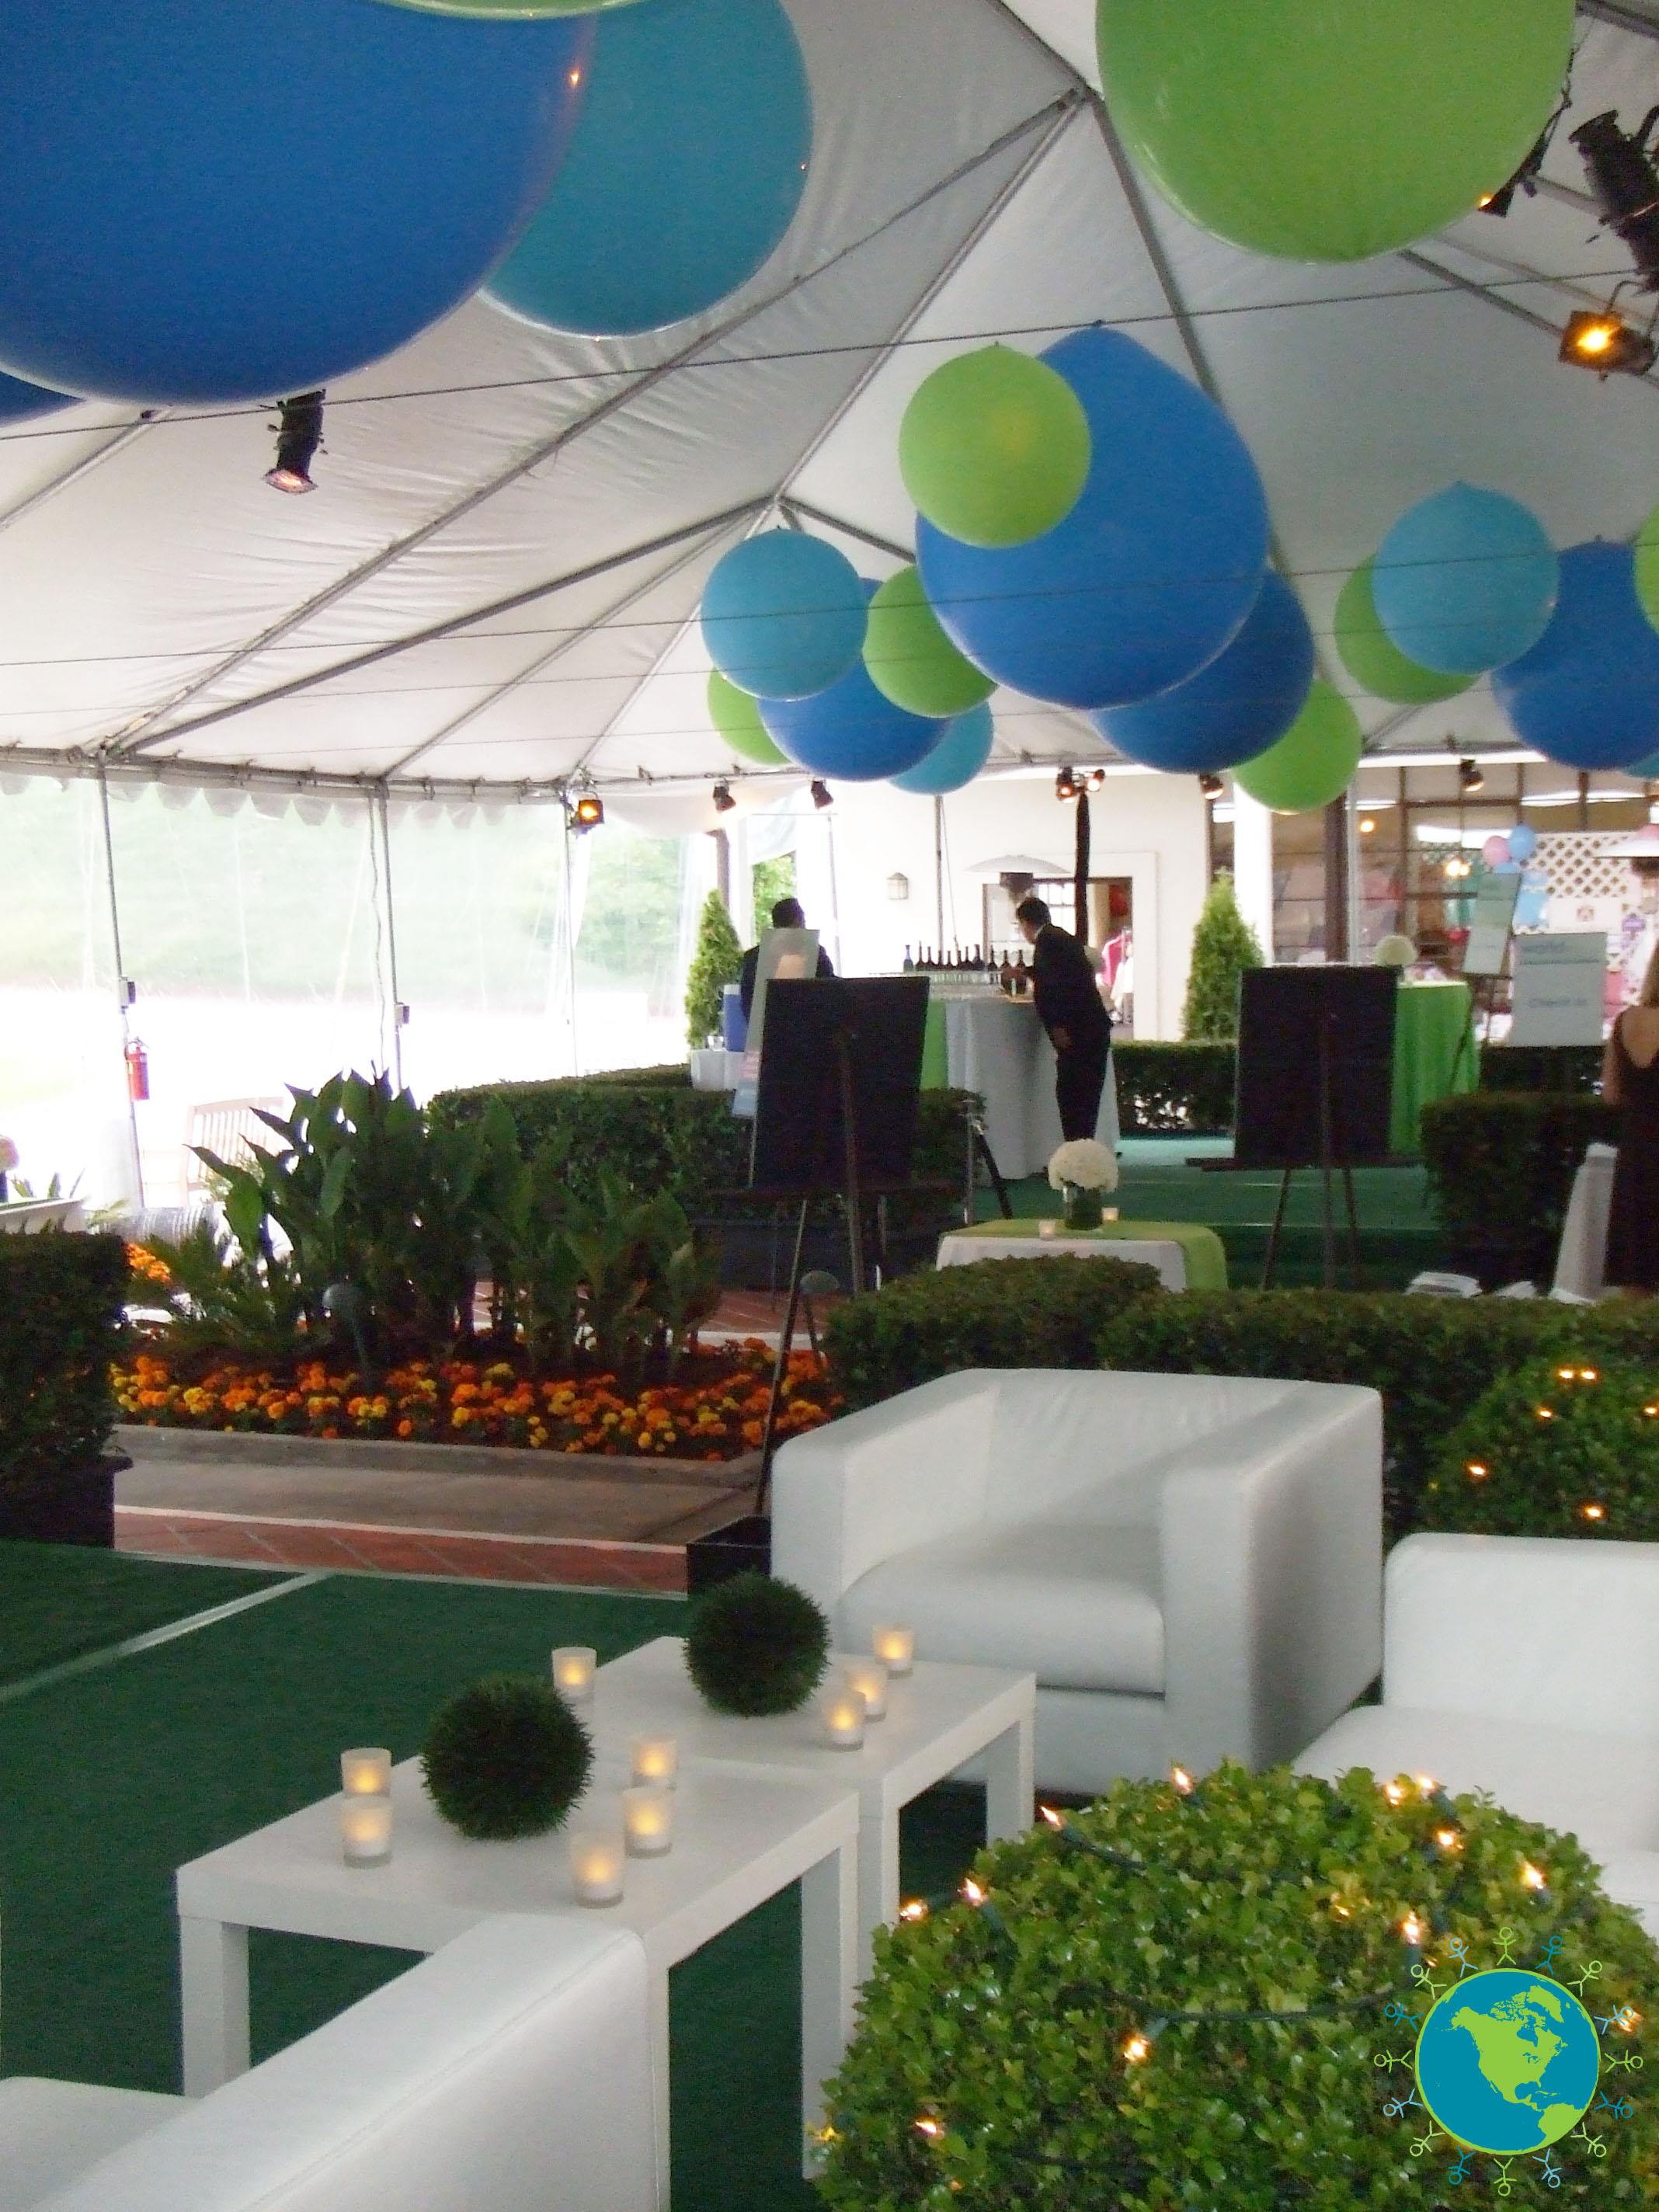 event space event decorations - Event Decorations